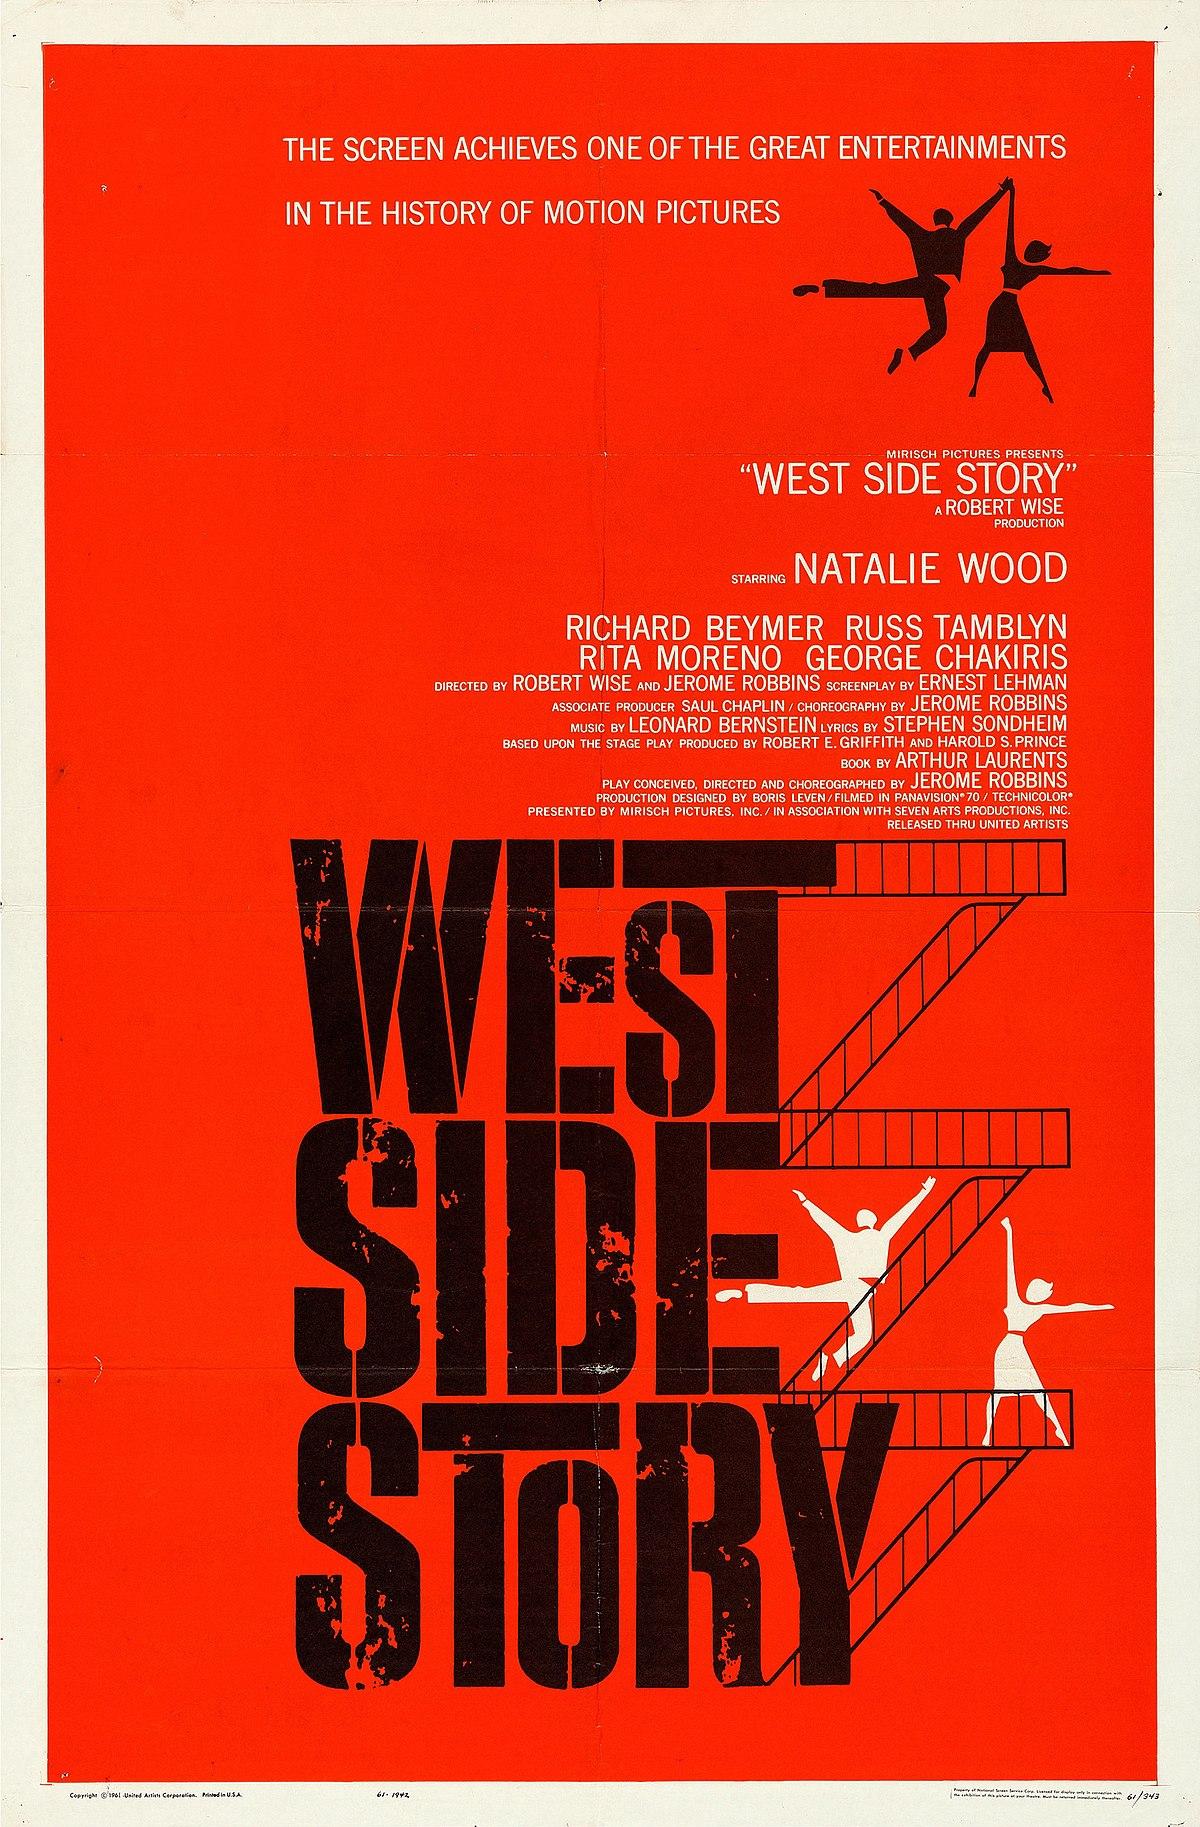 West Side Story, de Robert Wise et Jerome Robbins